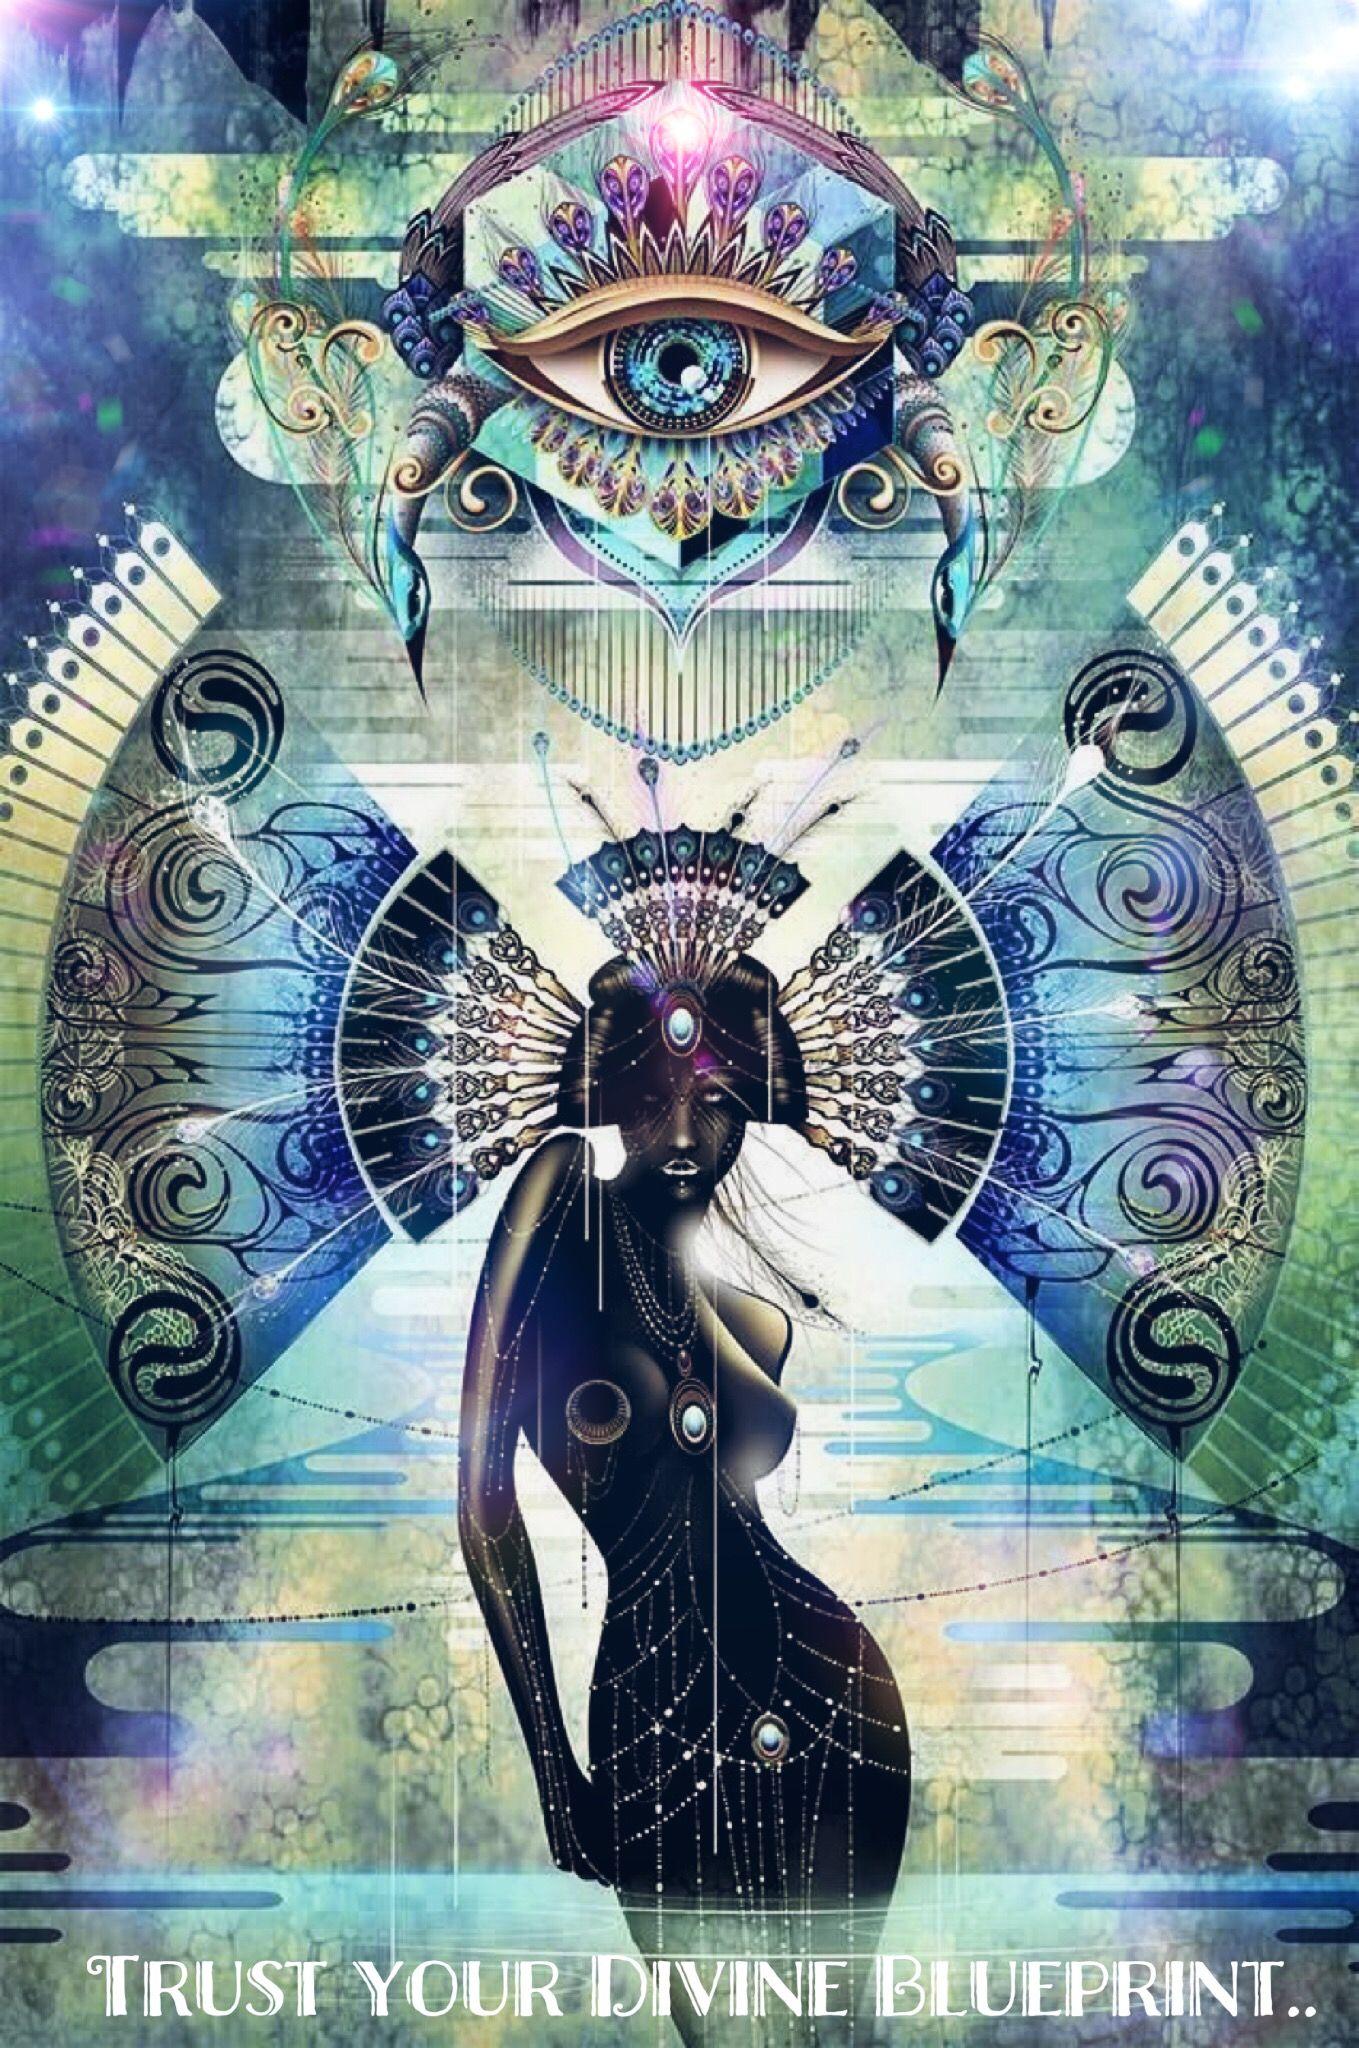 Trust your divine blueprint wild woman sisterhood trust your divine blueprint wild woman sisterhood wildwomansisterhood malvernweather Gallery